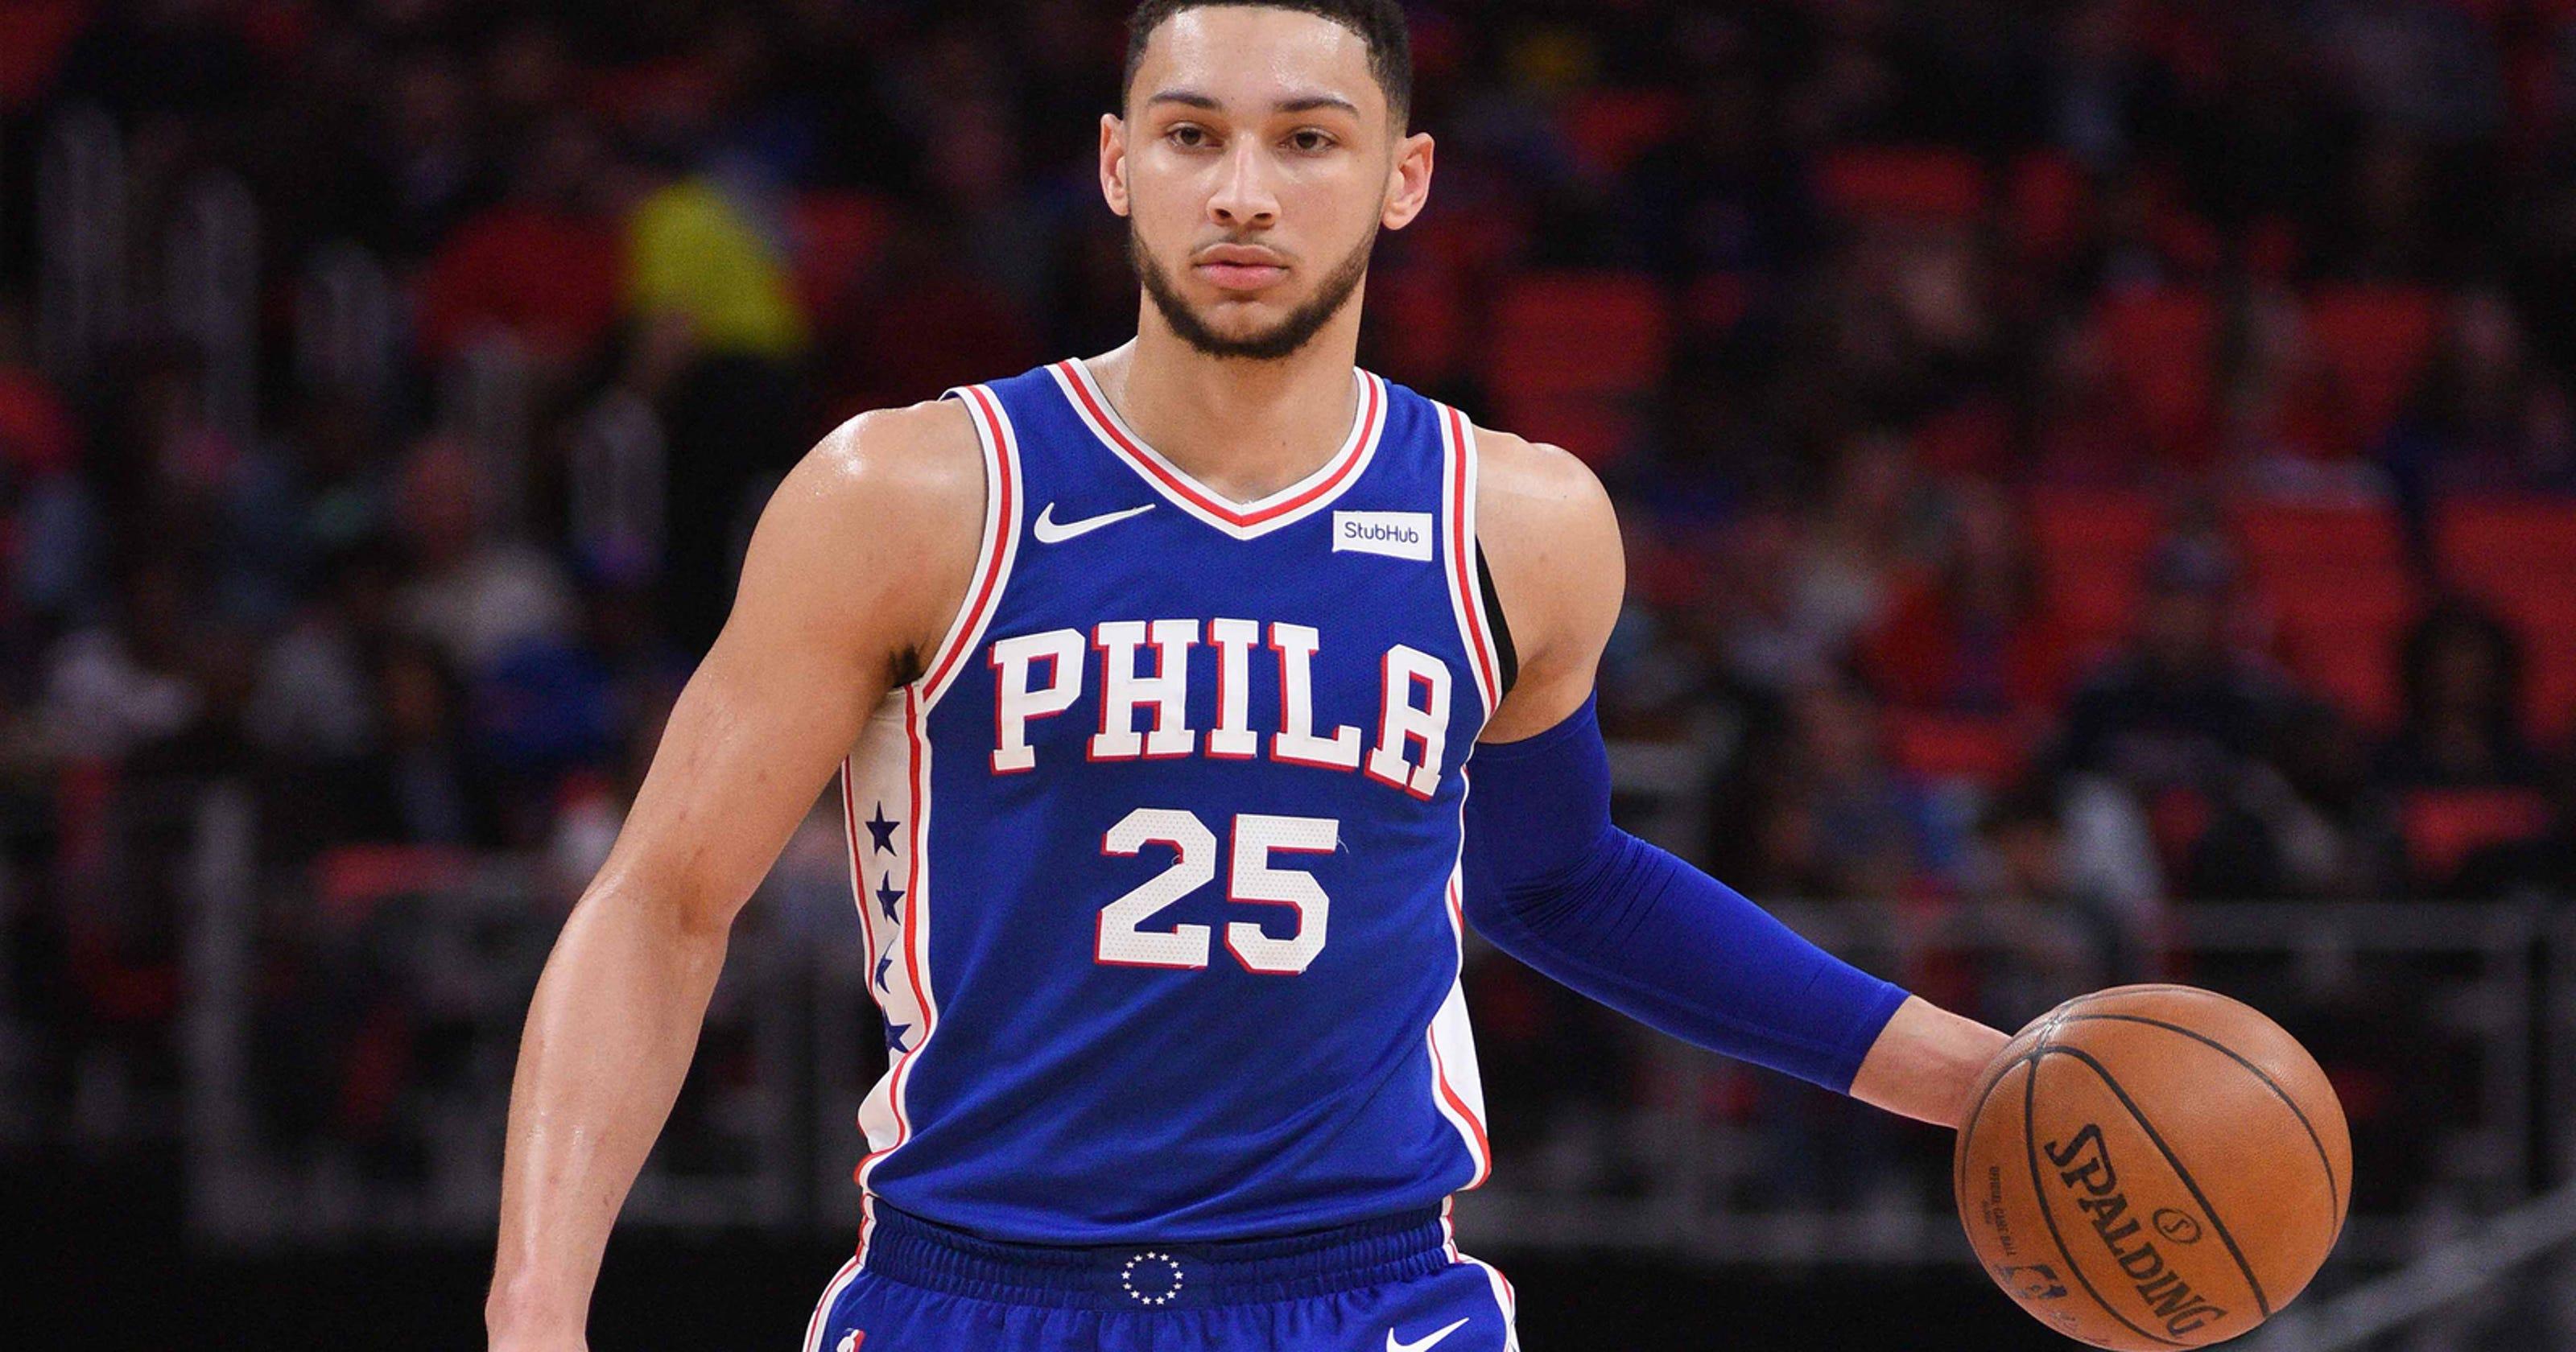 734b4af91 Philadelphia Sixers   Process  holds upper hand over Detroit Pistons